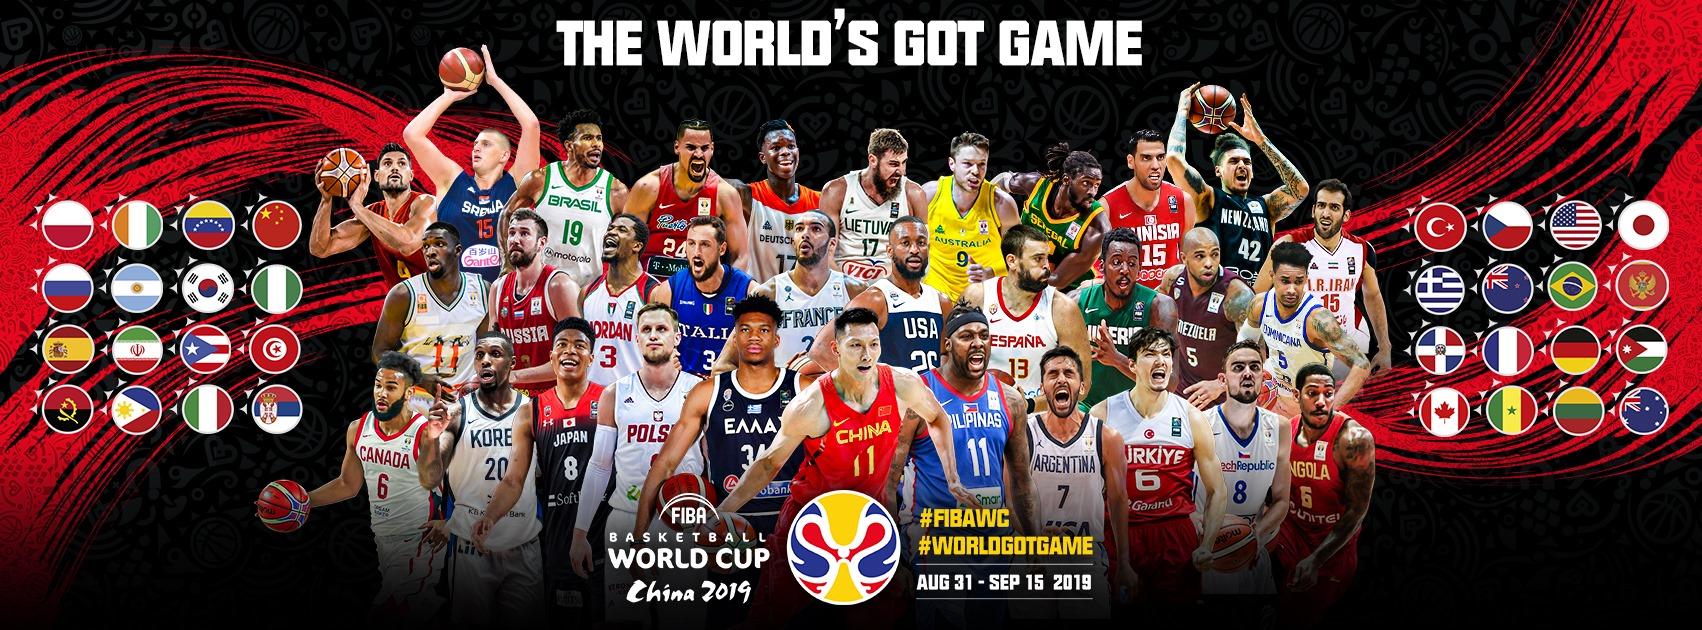 basketball world cup - photo #18